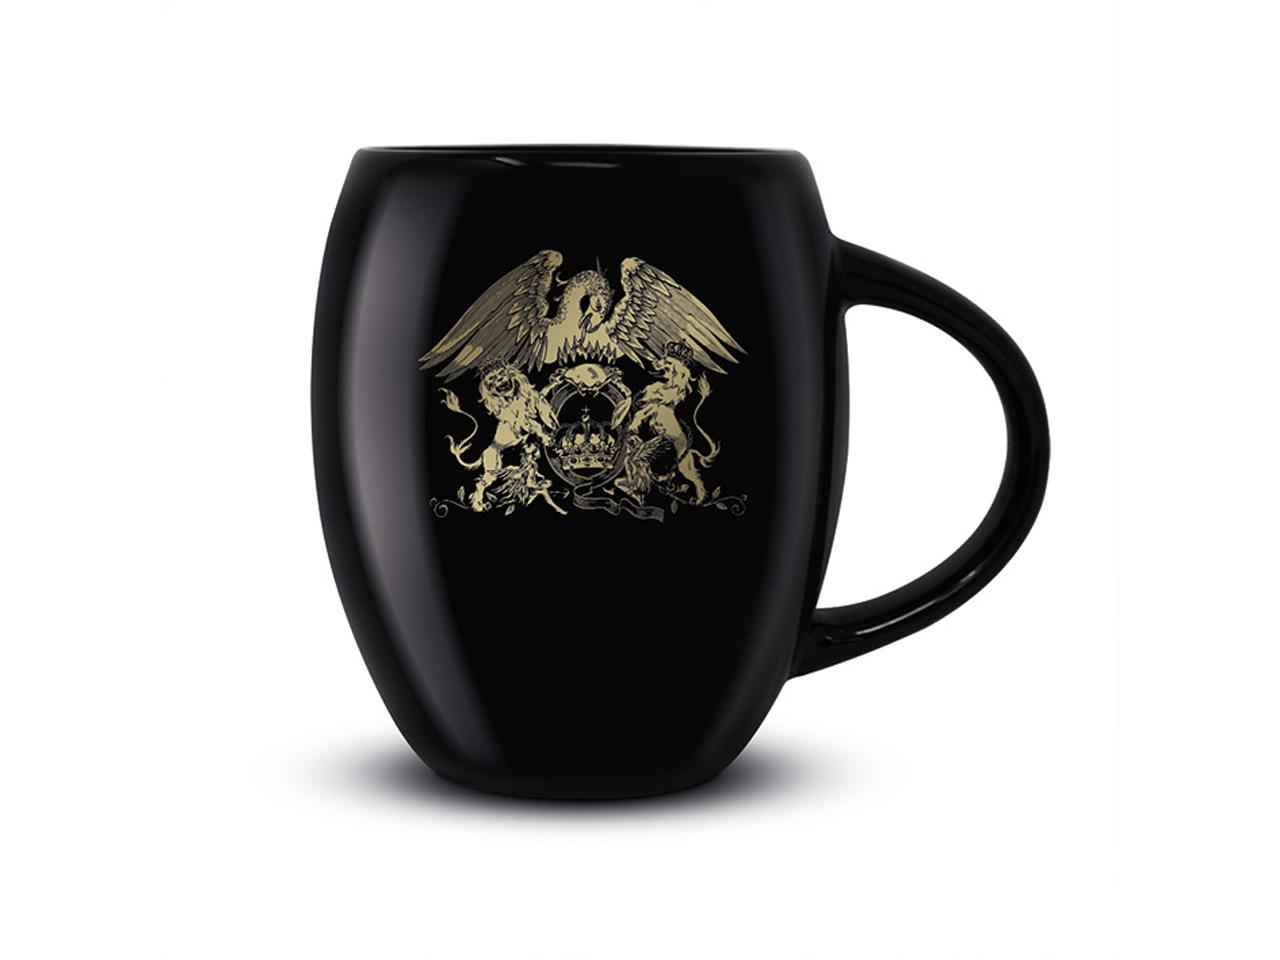 Queen Black Oval Mug Official Band Merch Gold Crest Logo Iconic Music Rock Classic Retro Nostalgia